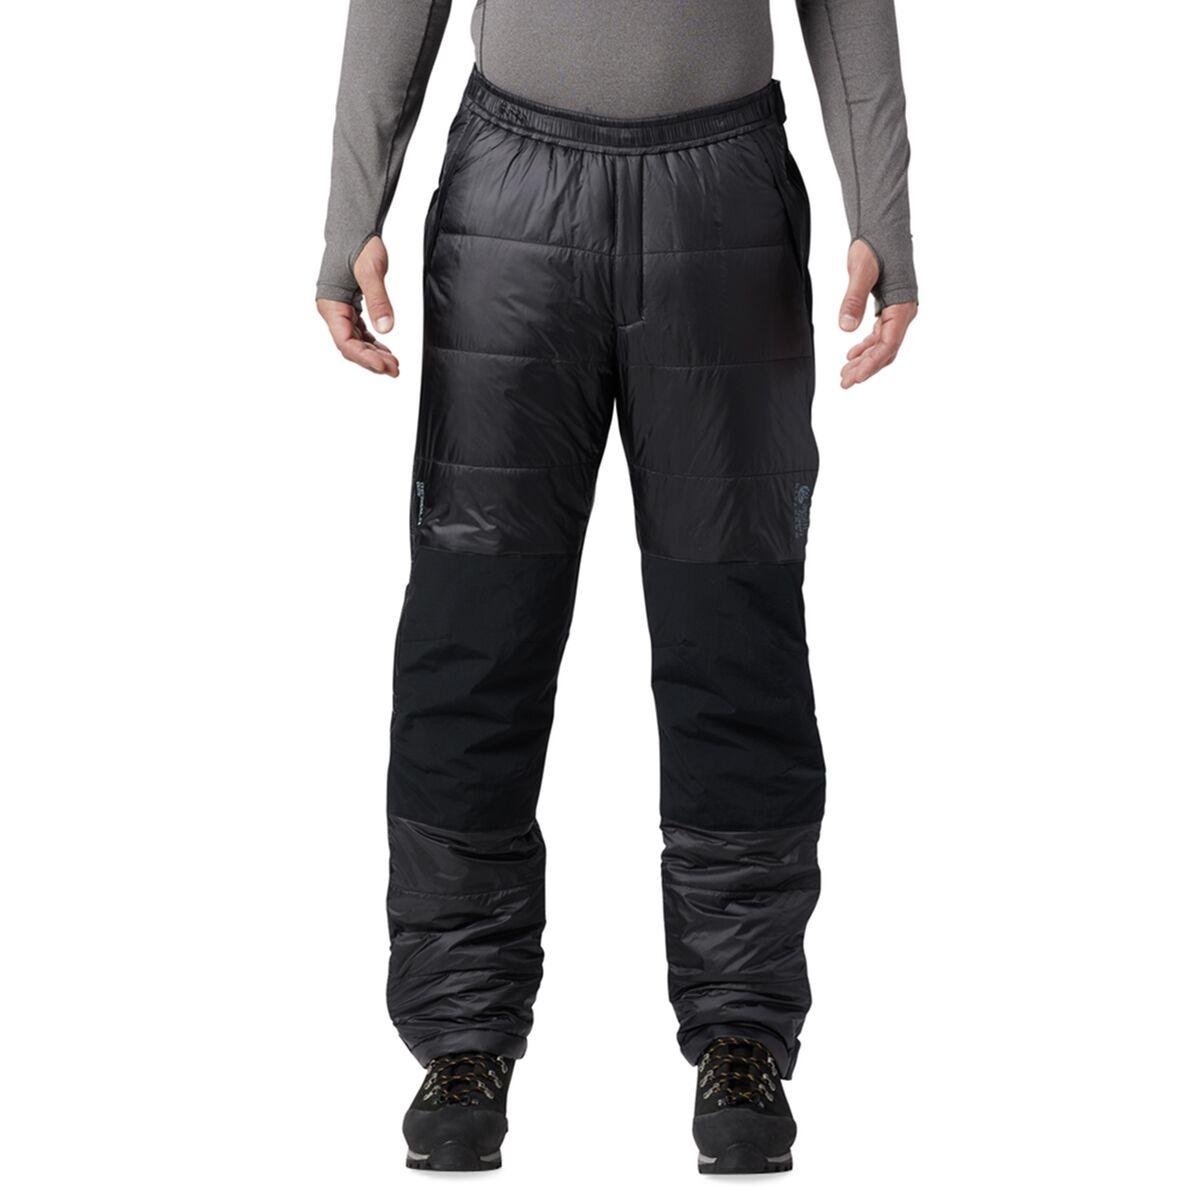 Mountain Hardwear Compressor Pant